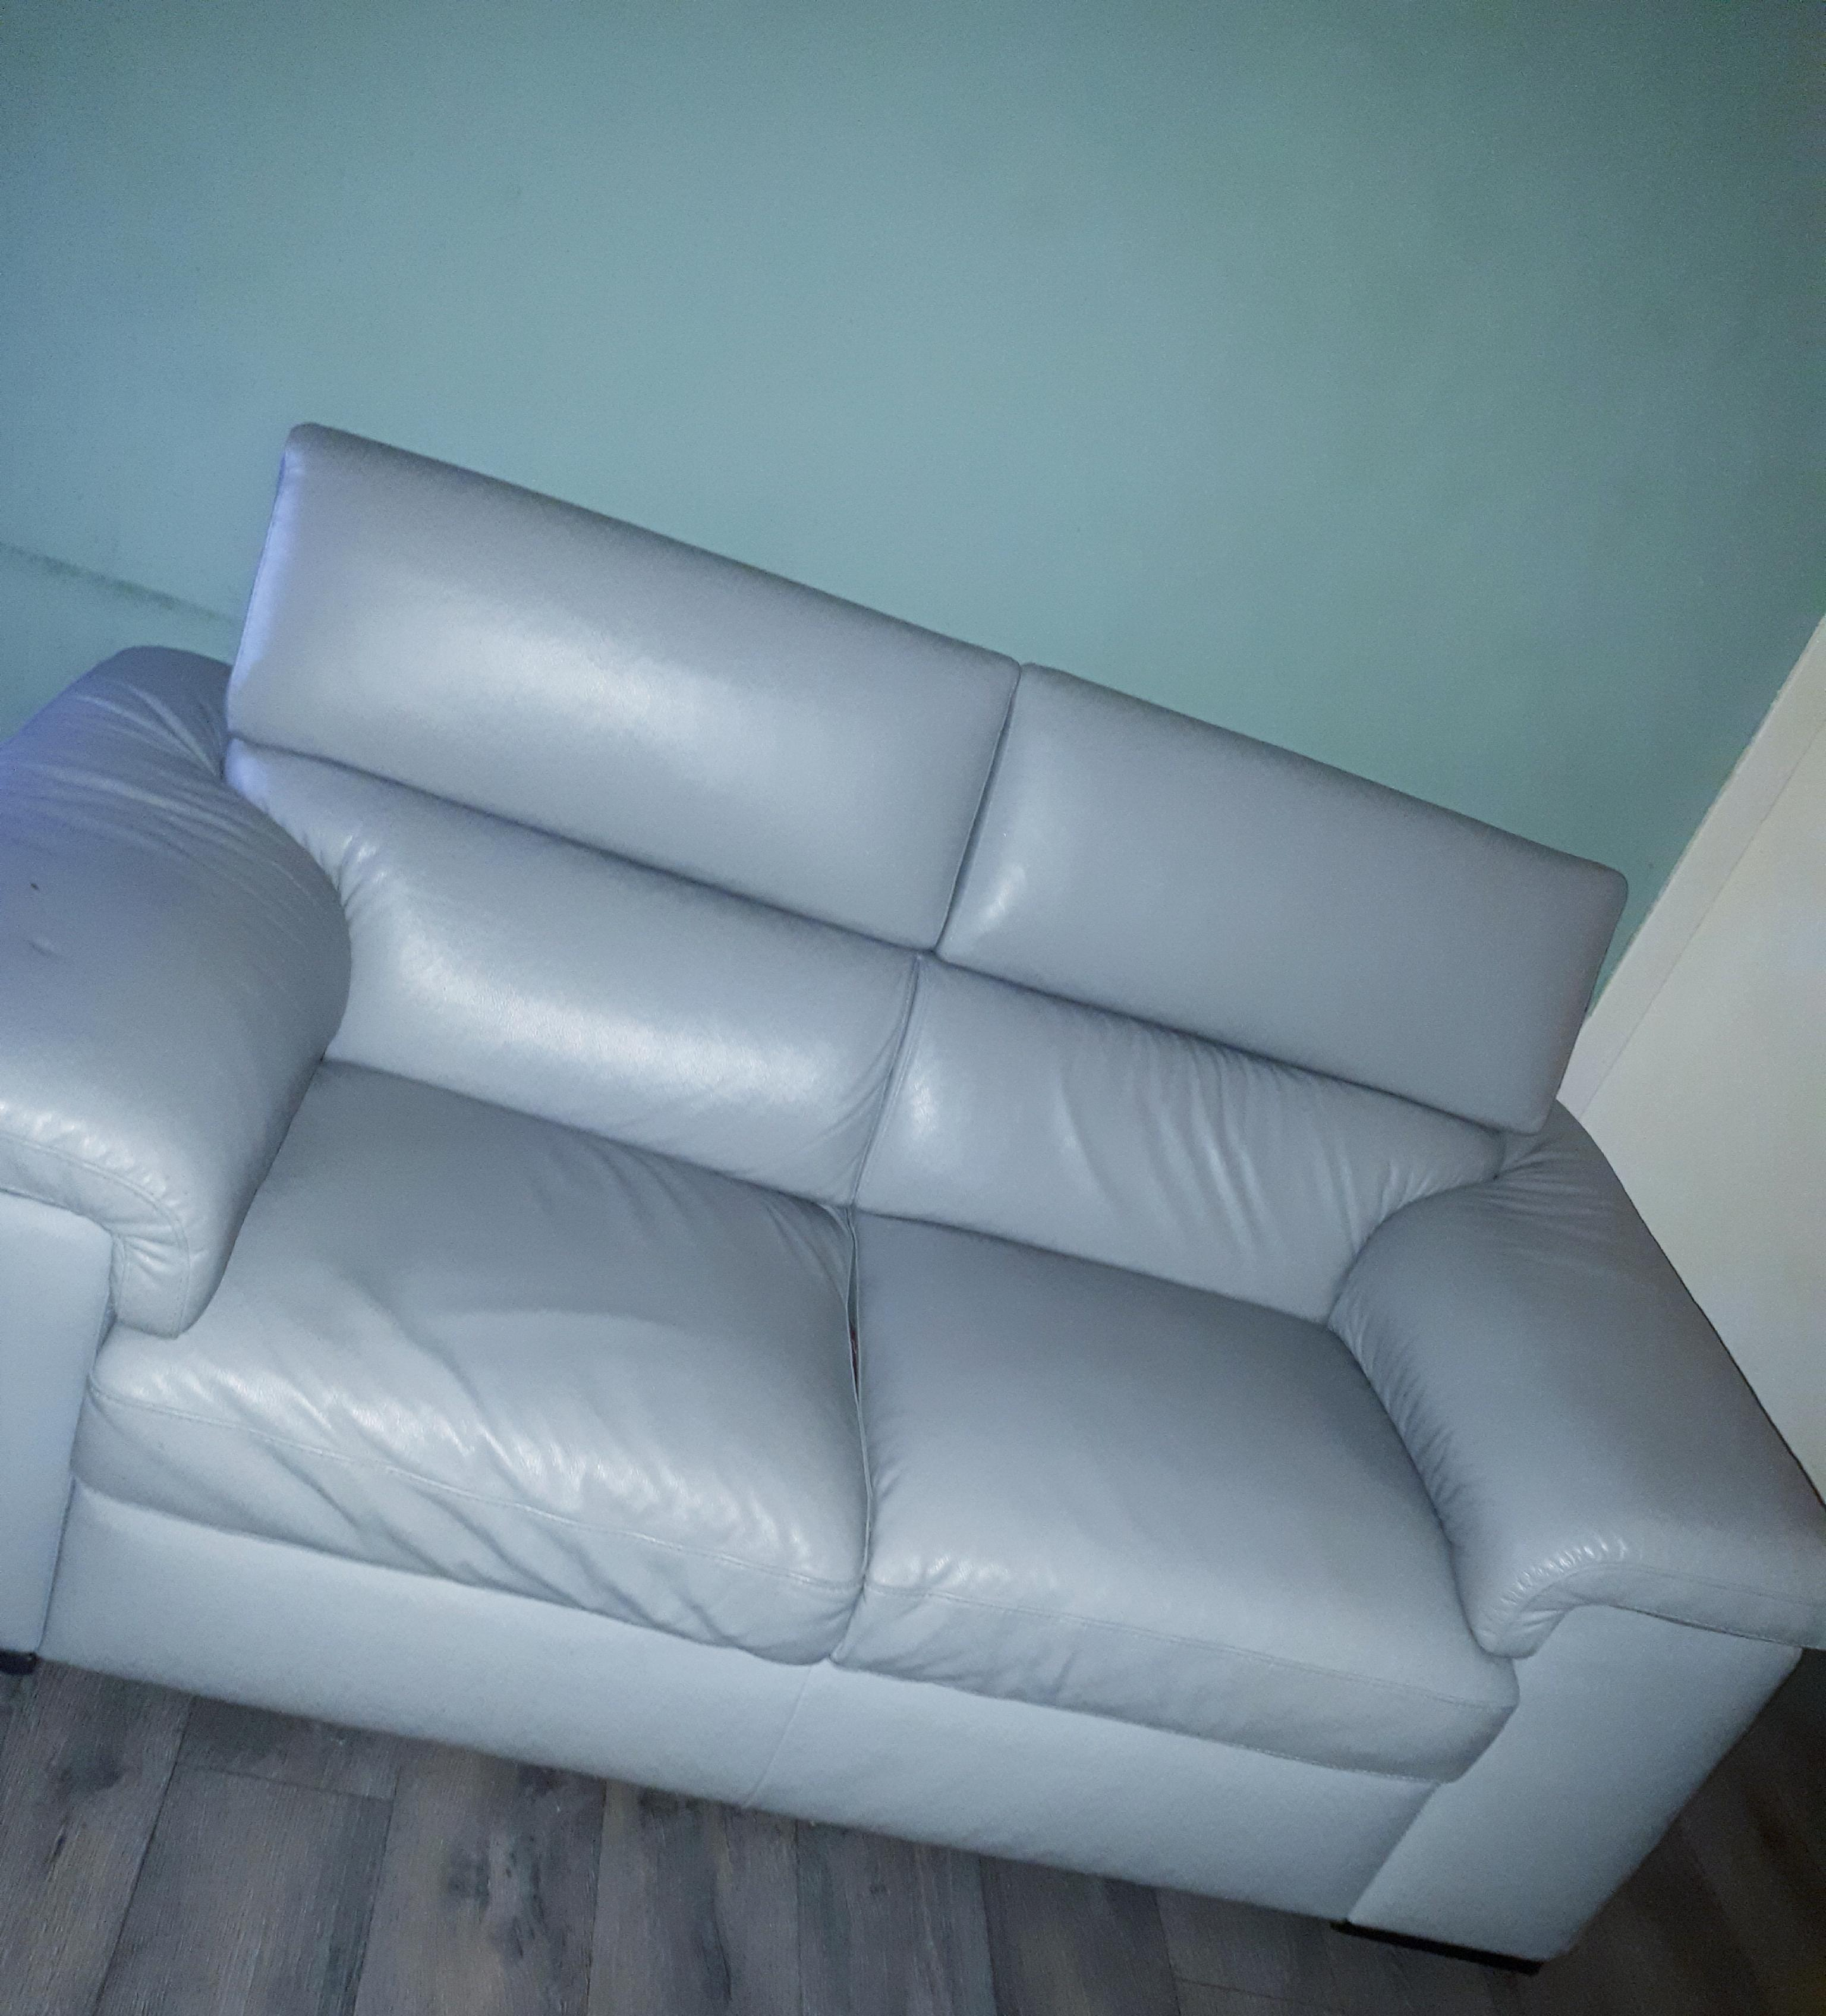 2x2 Grey Italian Bespoke Leather Sofas - Great Condition